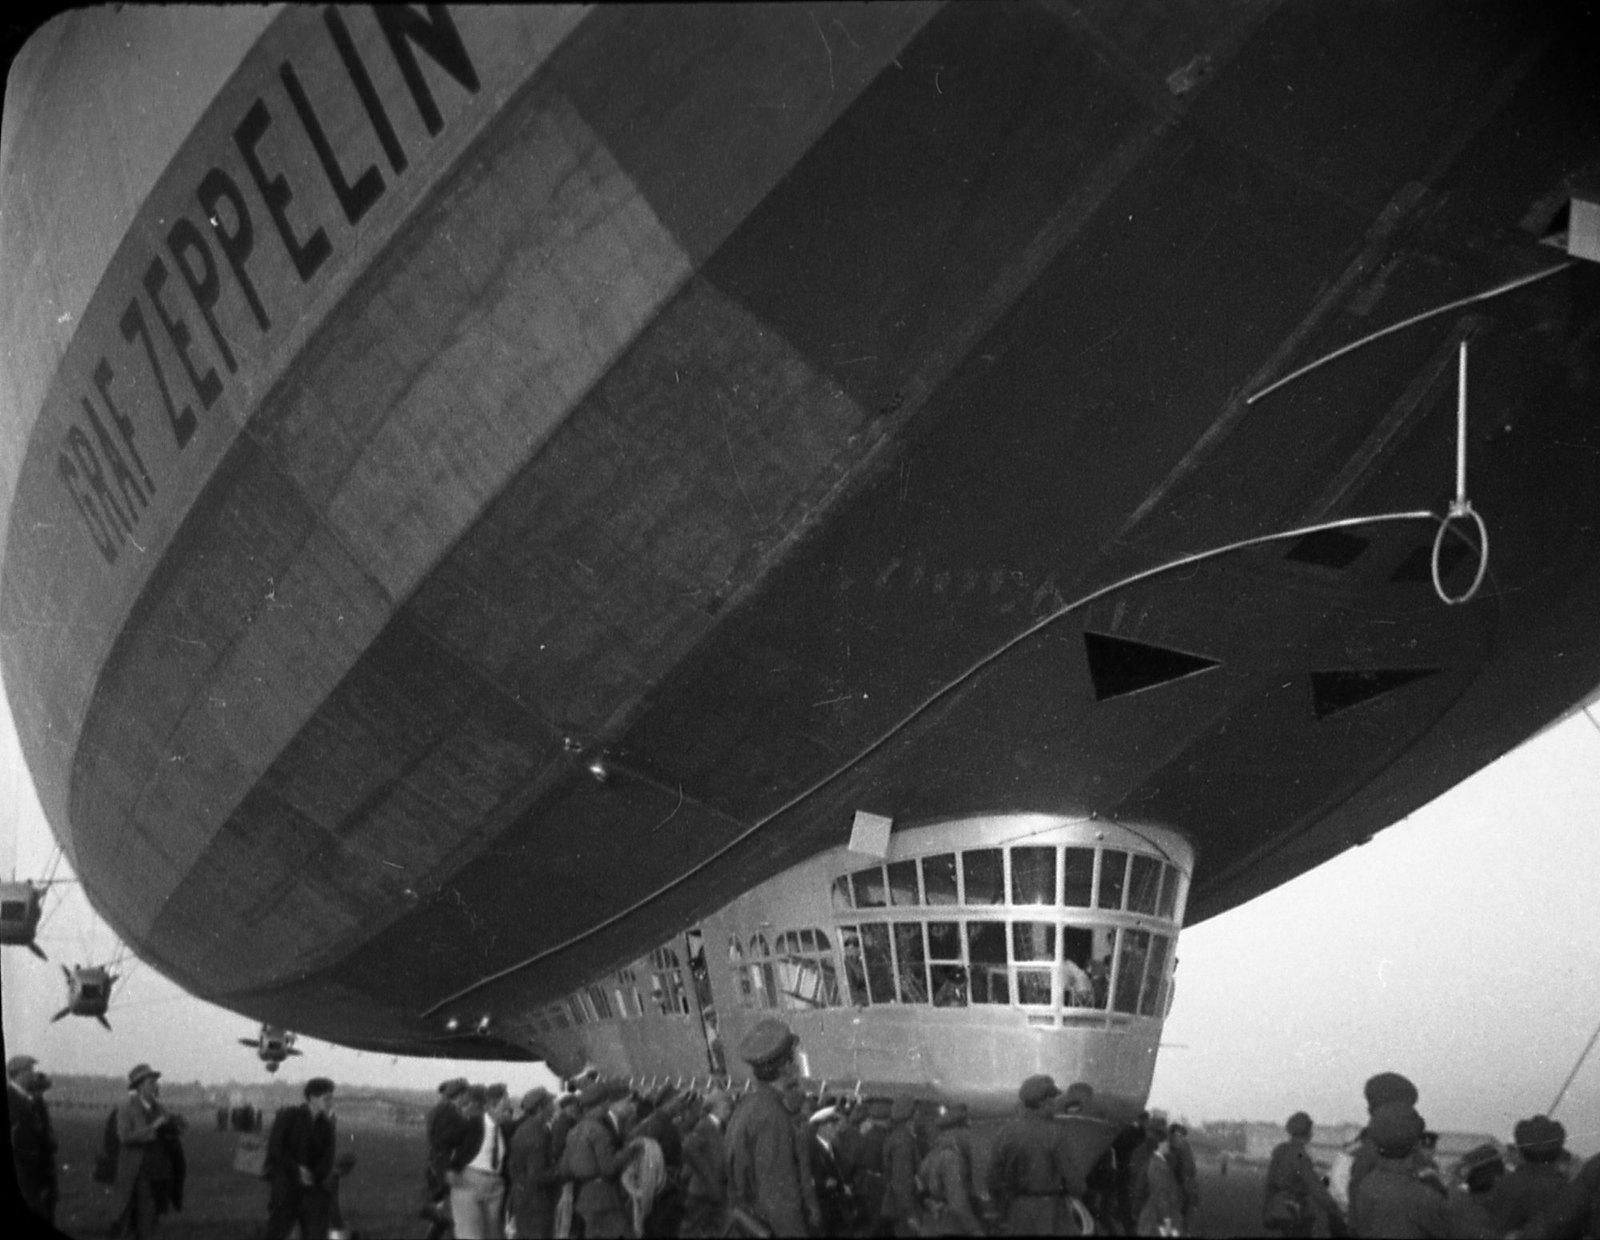 1930. Дирижабль «Graf Zeppelin». (1)